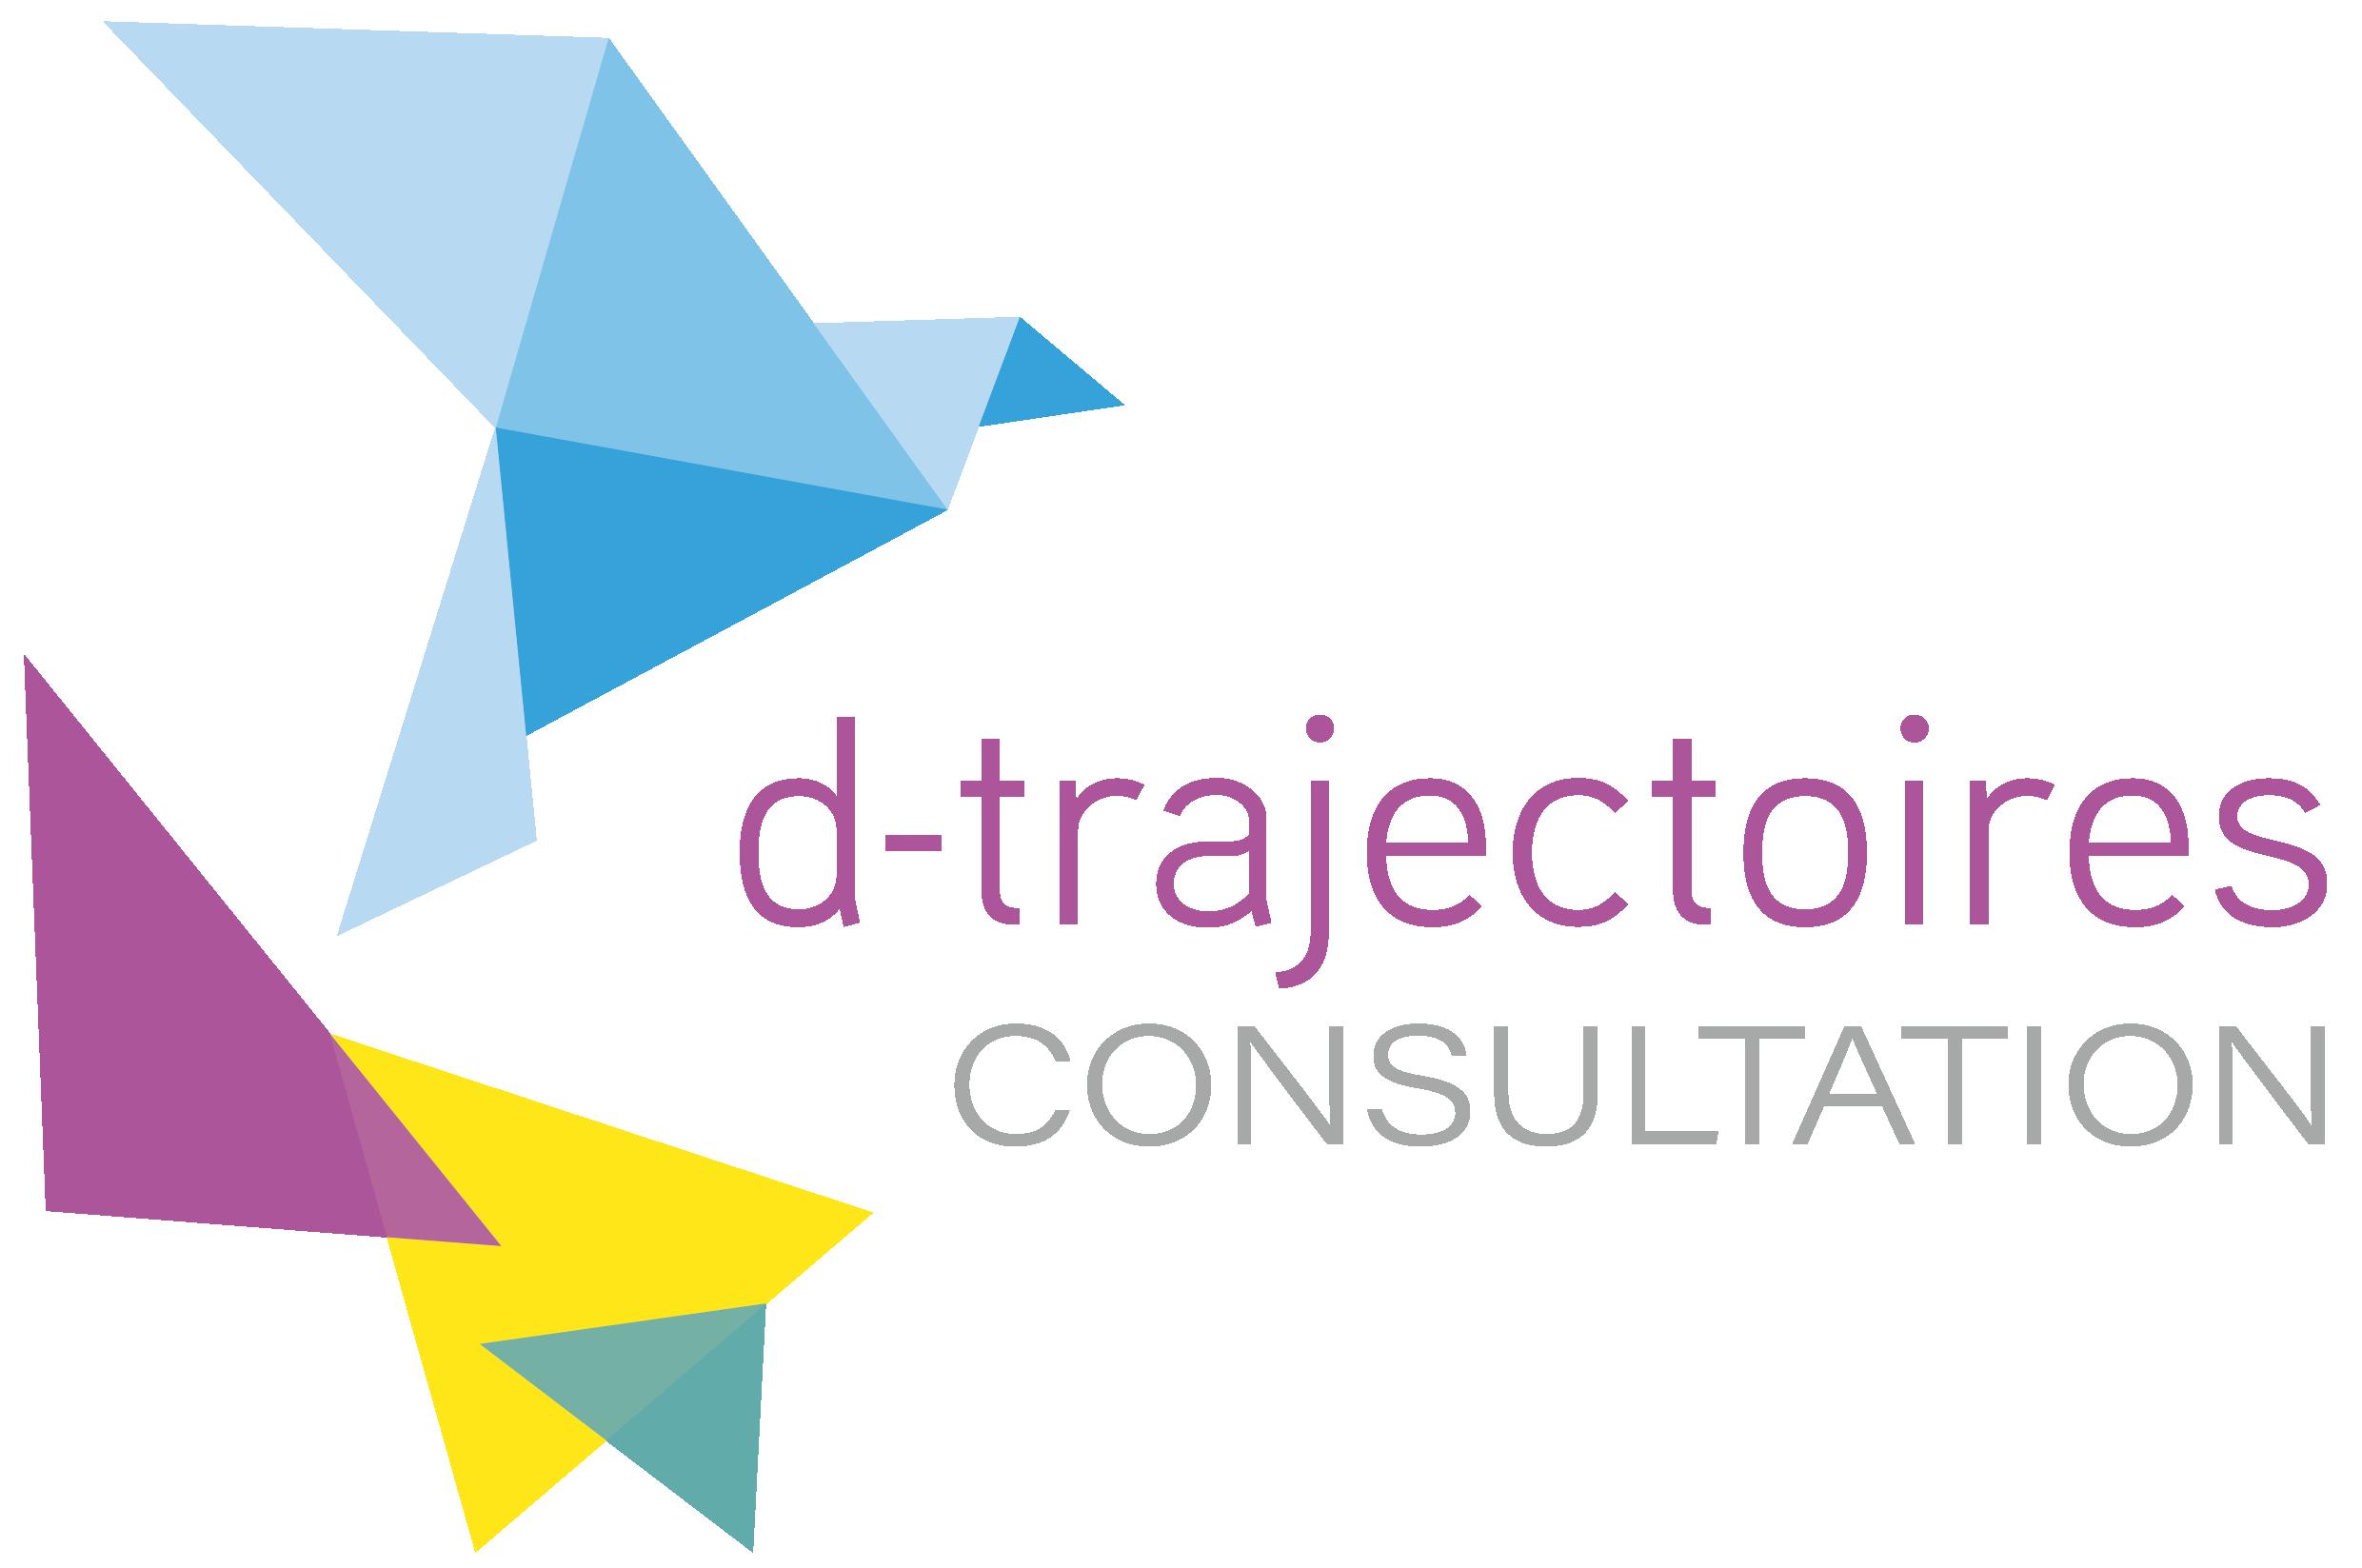 d-trajectoires - consultation